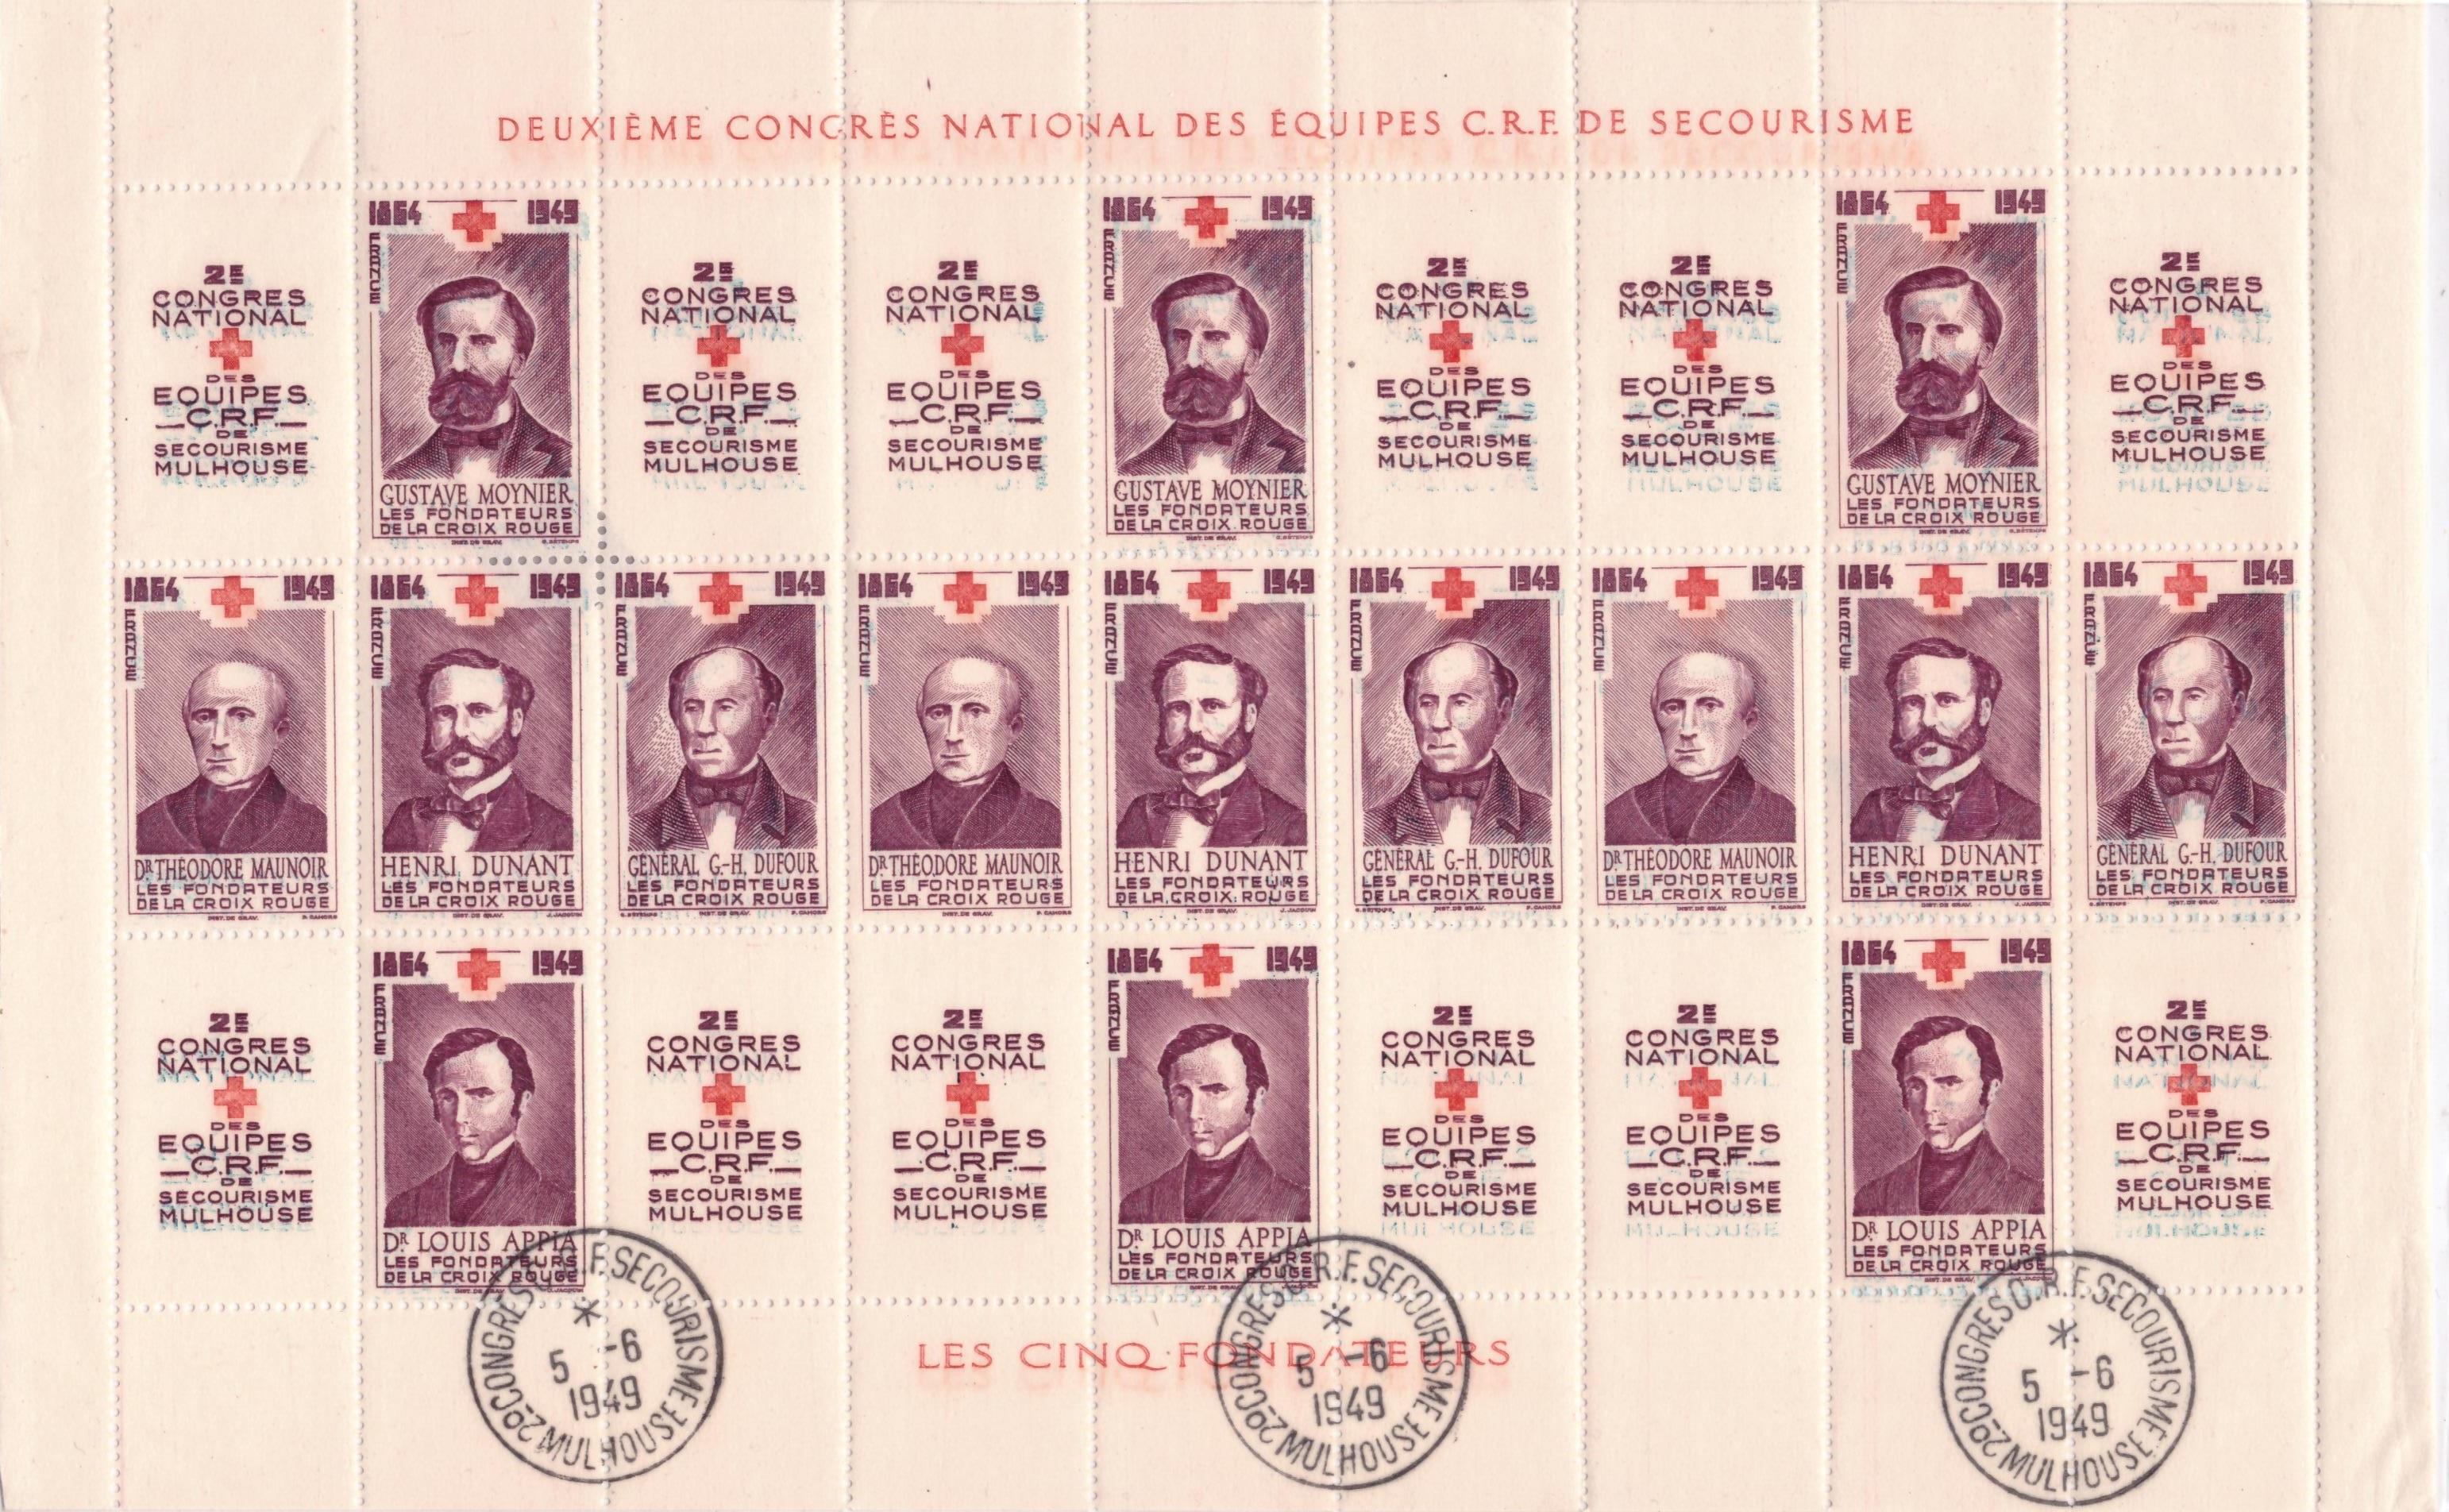 feuille_2_eme_congres_nationale_croix_rouge_1949_2.jpg